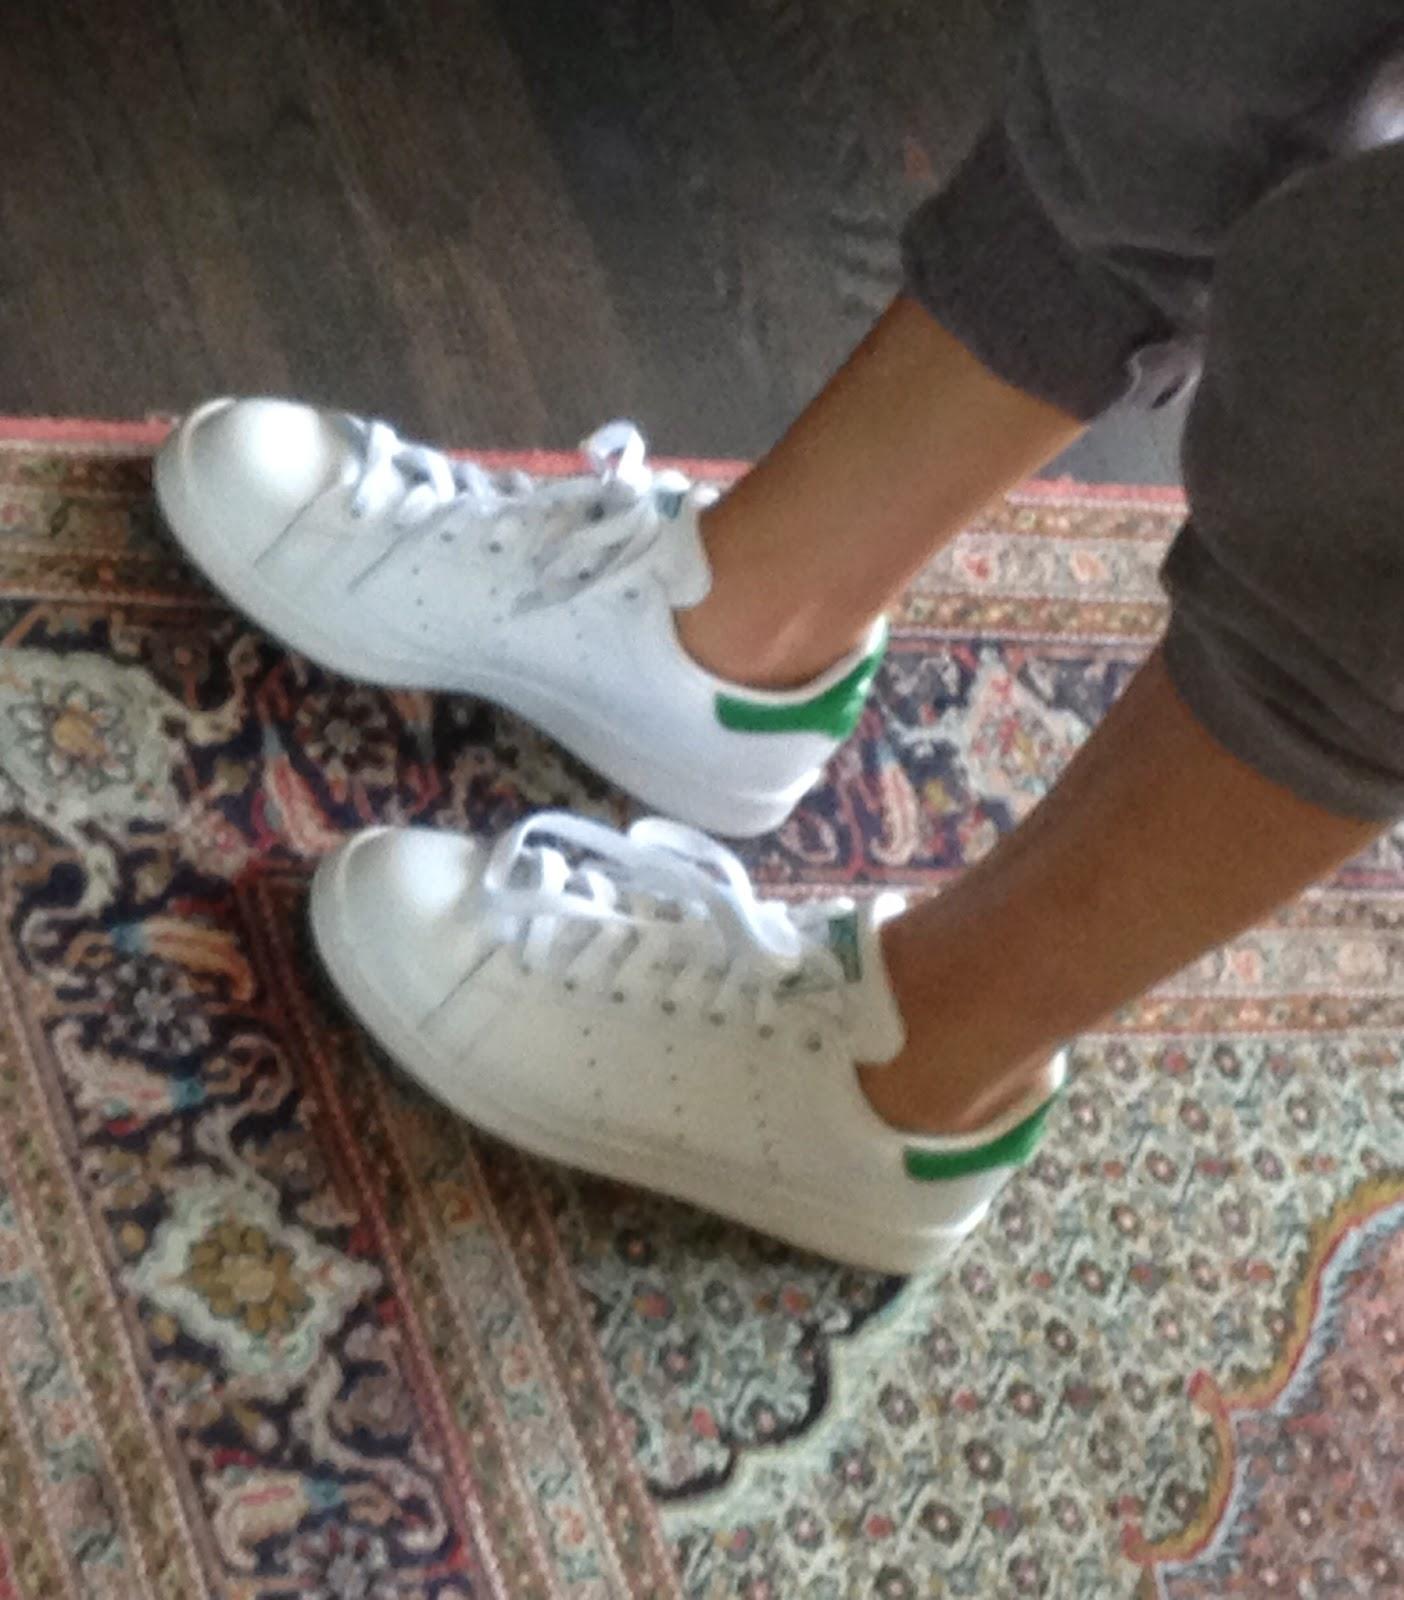 Adidas Superstar Vs Stan Smith Sizing aoriginal.co.uk 73b188b4c